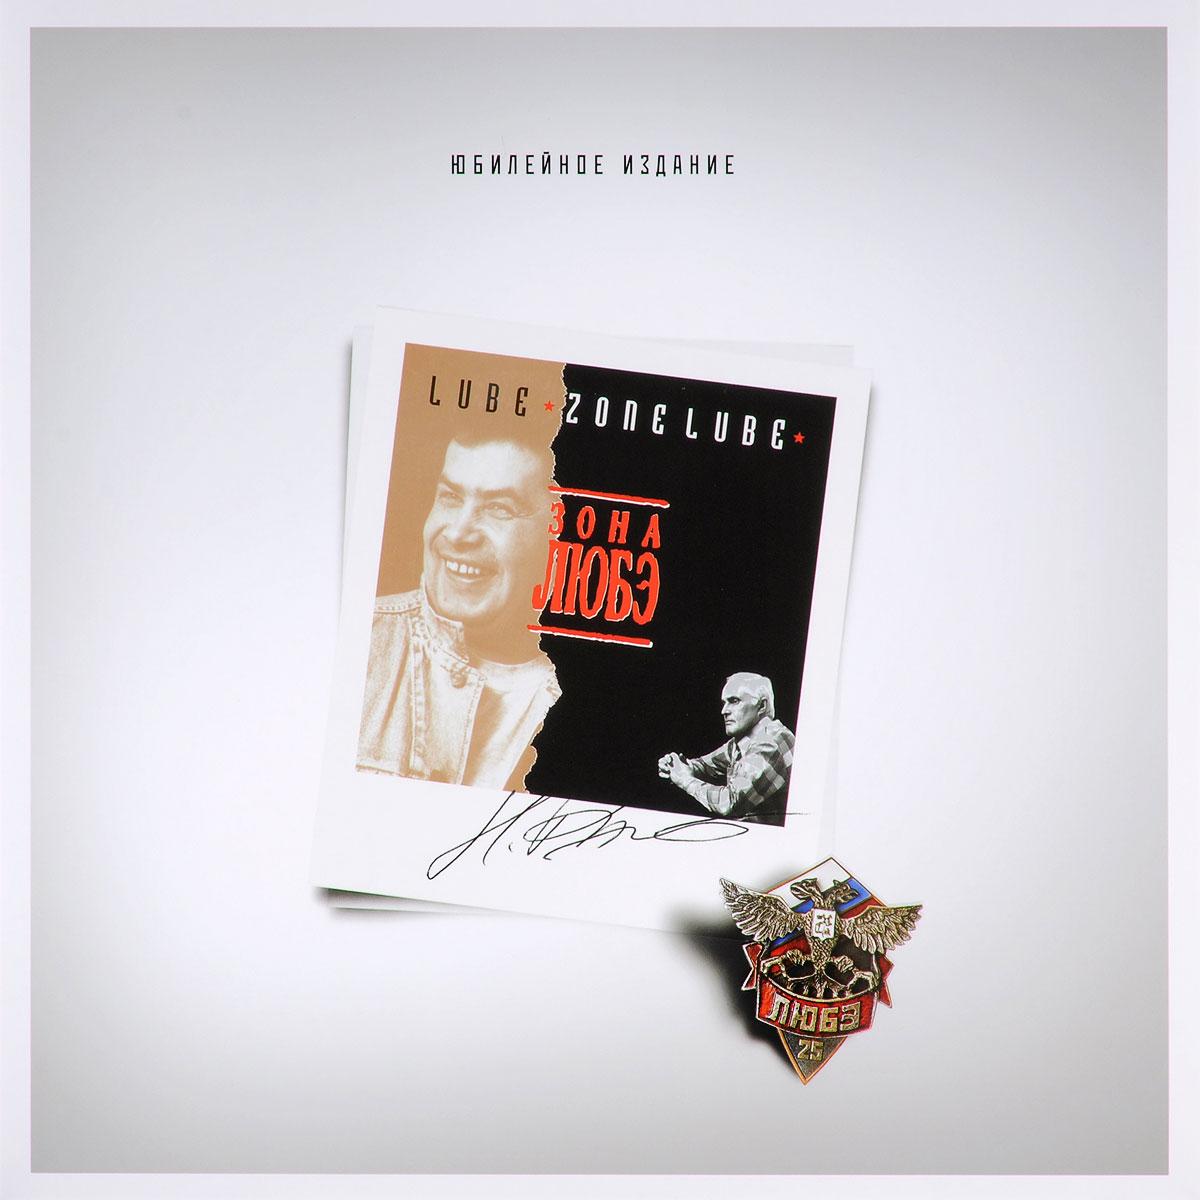 LP 1:Tracks 1 - 5LP 2:Tracks 6- - 10